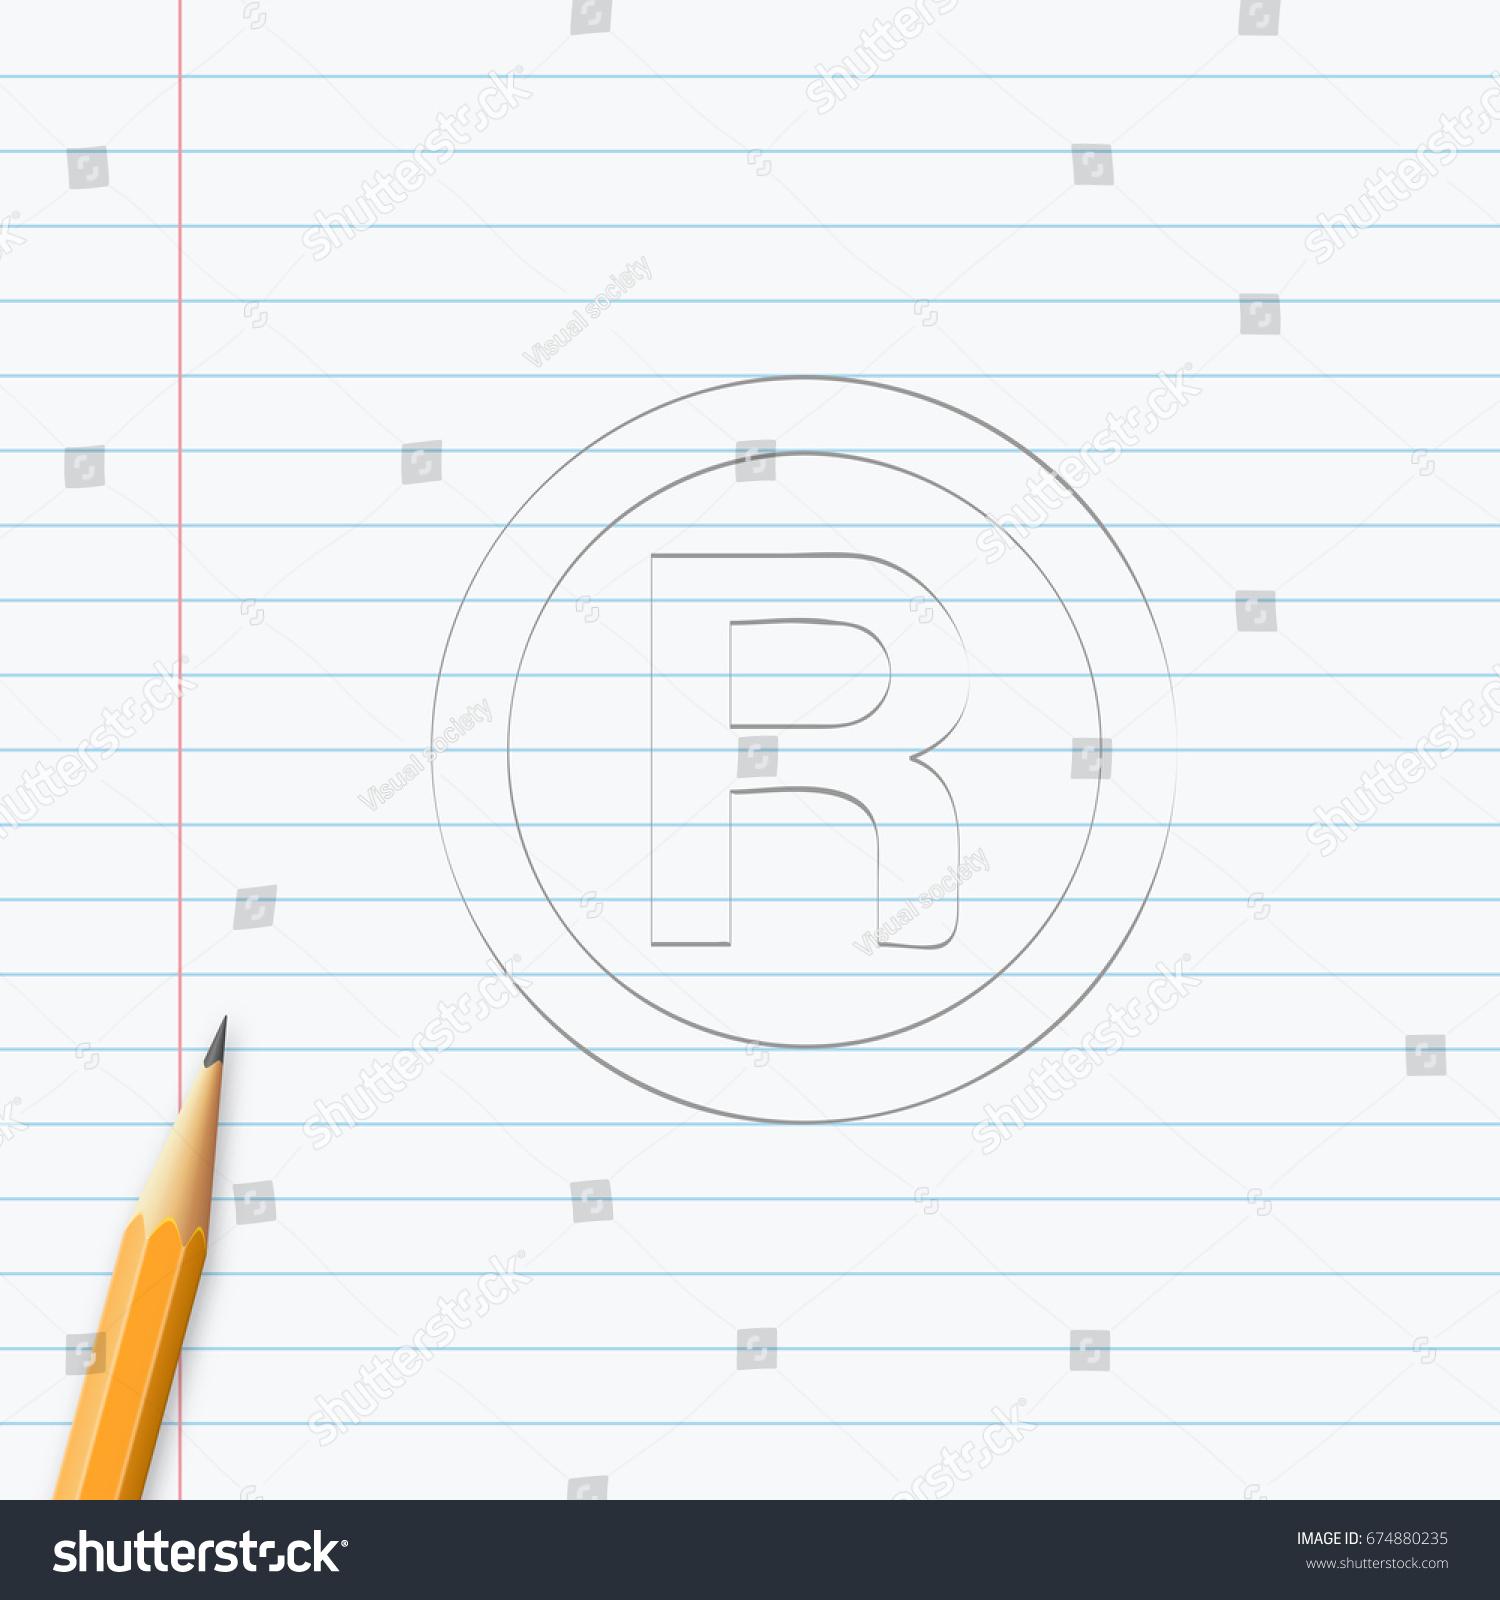 R Registered Trademark Symbol Hand Drawn Stock Vector Royalty Free